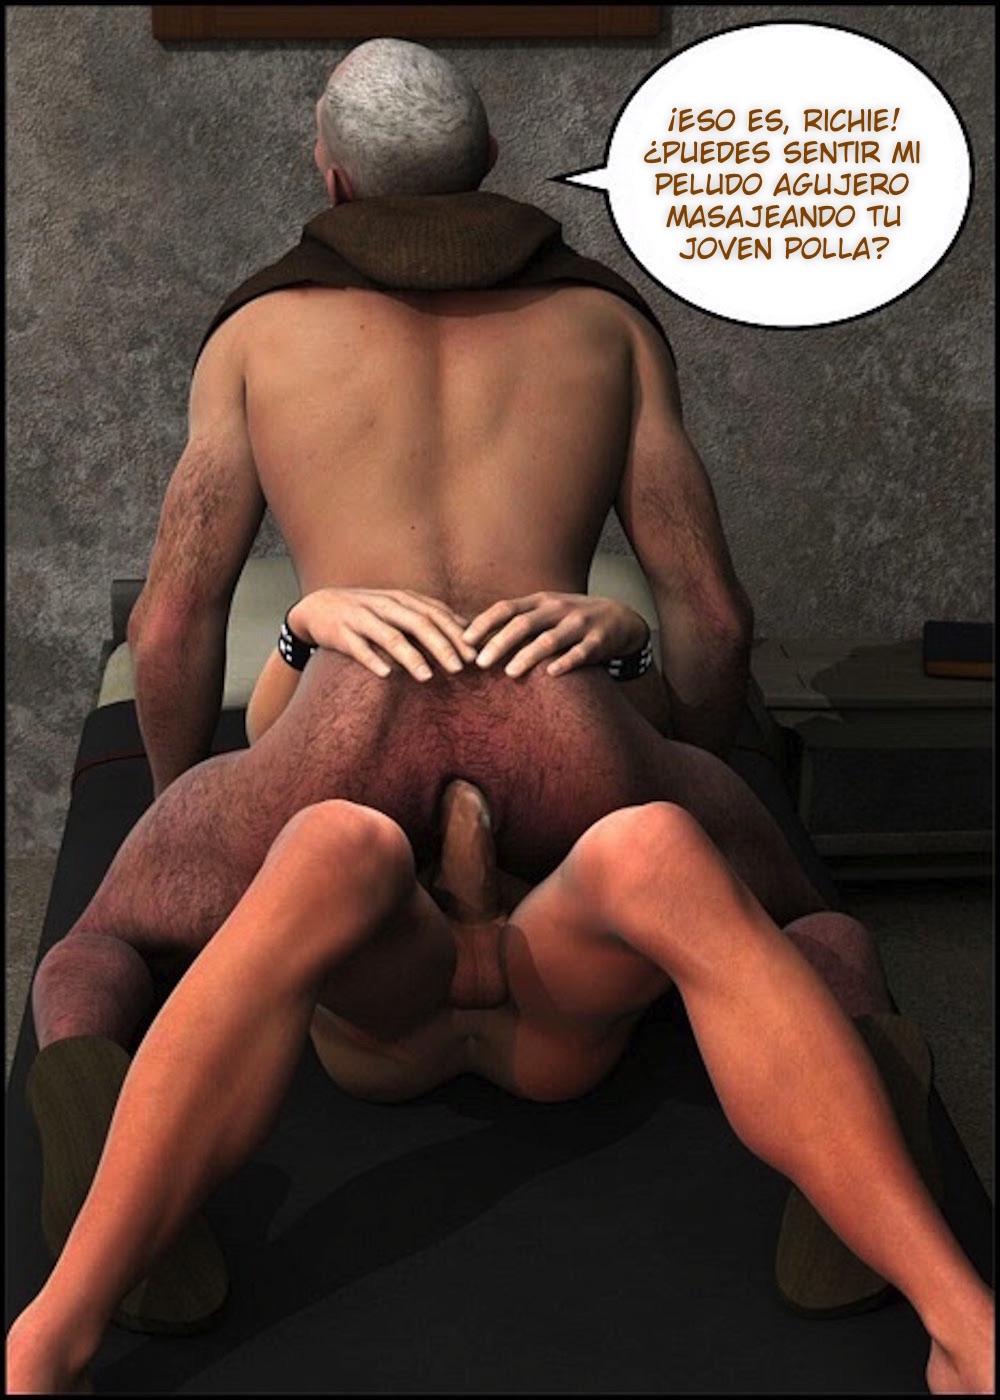 Vídeos de chicos jovencitos desnudos gratis - SEXO GAY